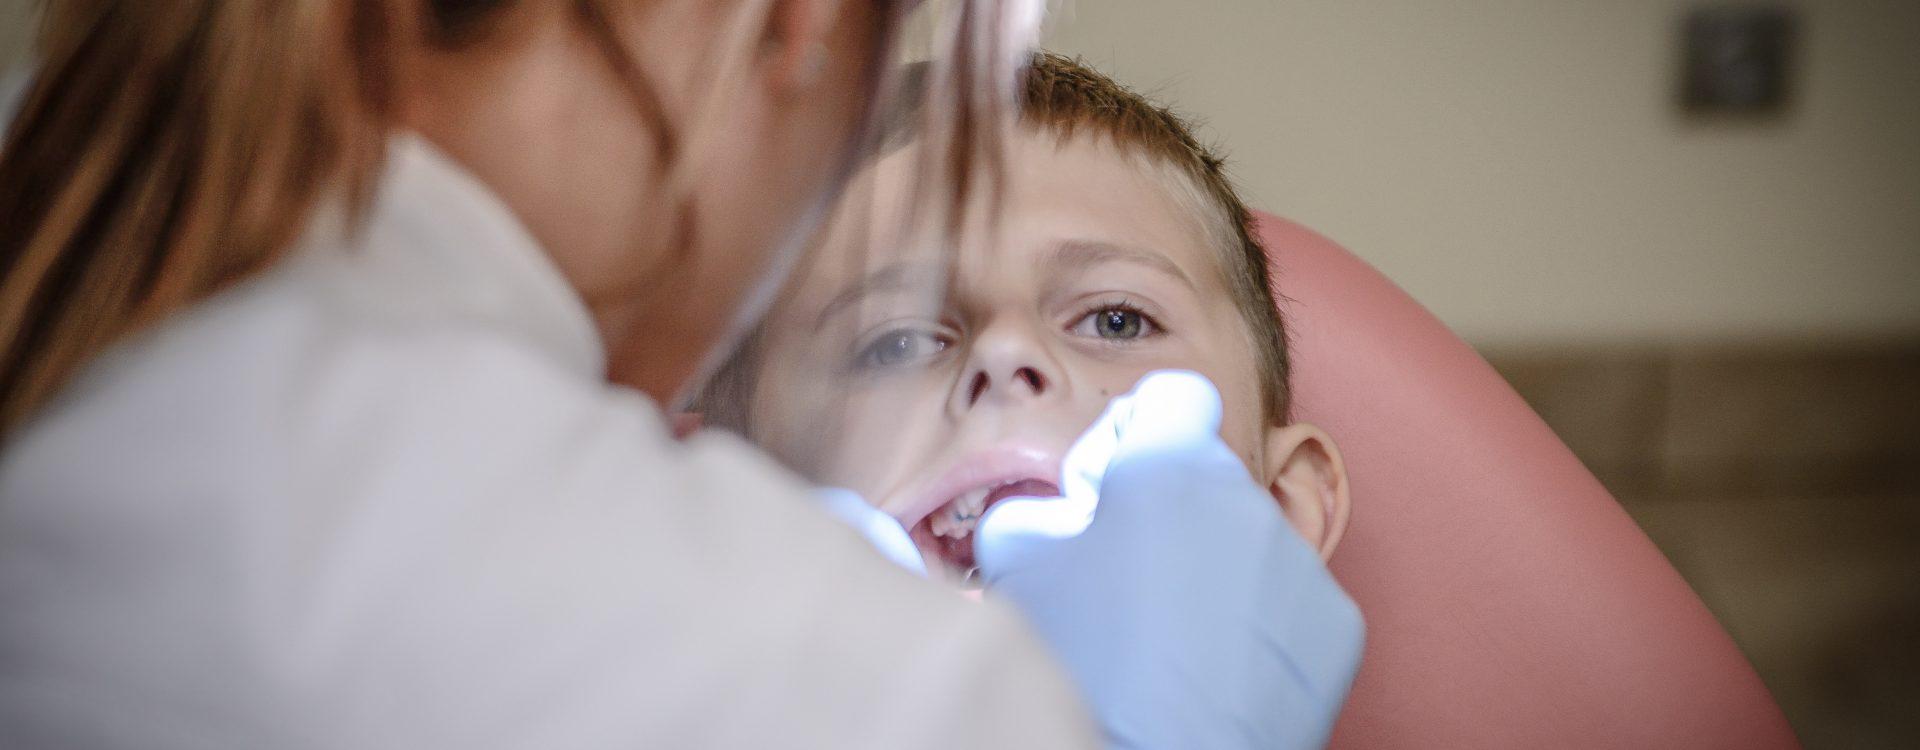 dentist-428647